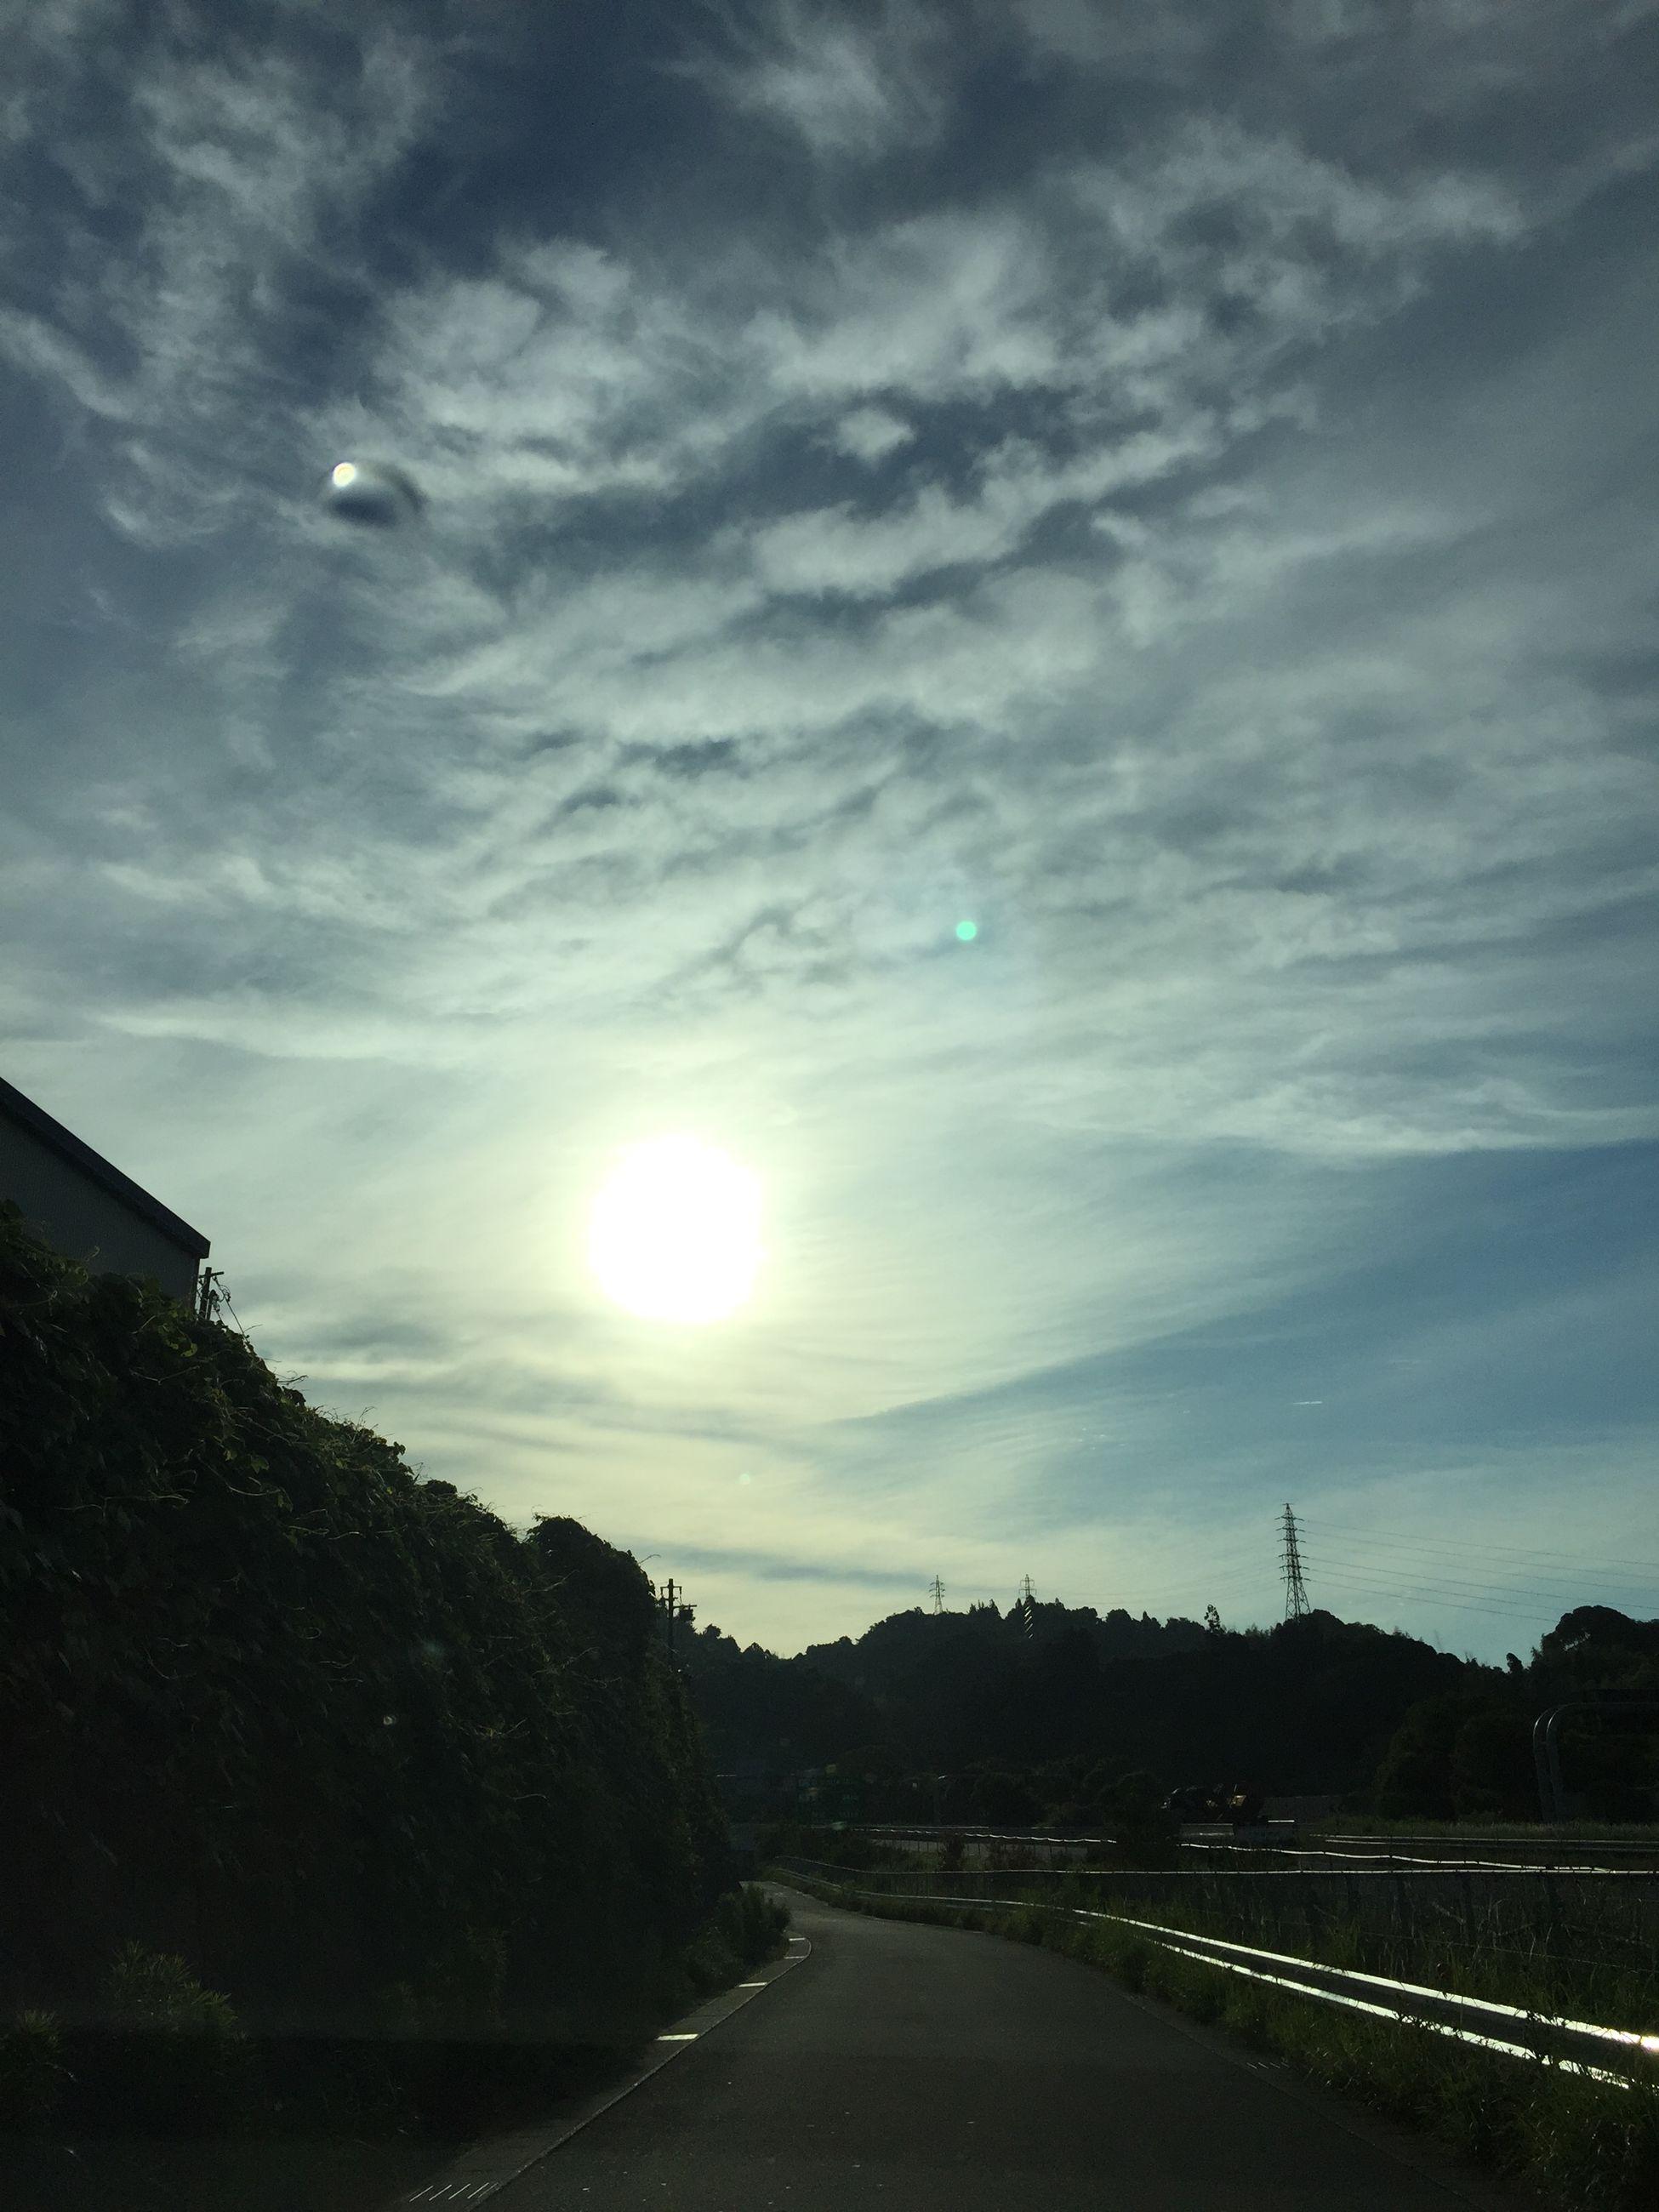 sky, building exterior, sun, built structure, architecture, cloud - sky, sunset, sunlight, lens flare, sunbeam, transportation, cloud, low angle view, street, silhouette, outdoors, nature, cloudy, city, building